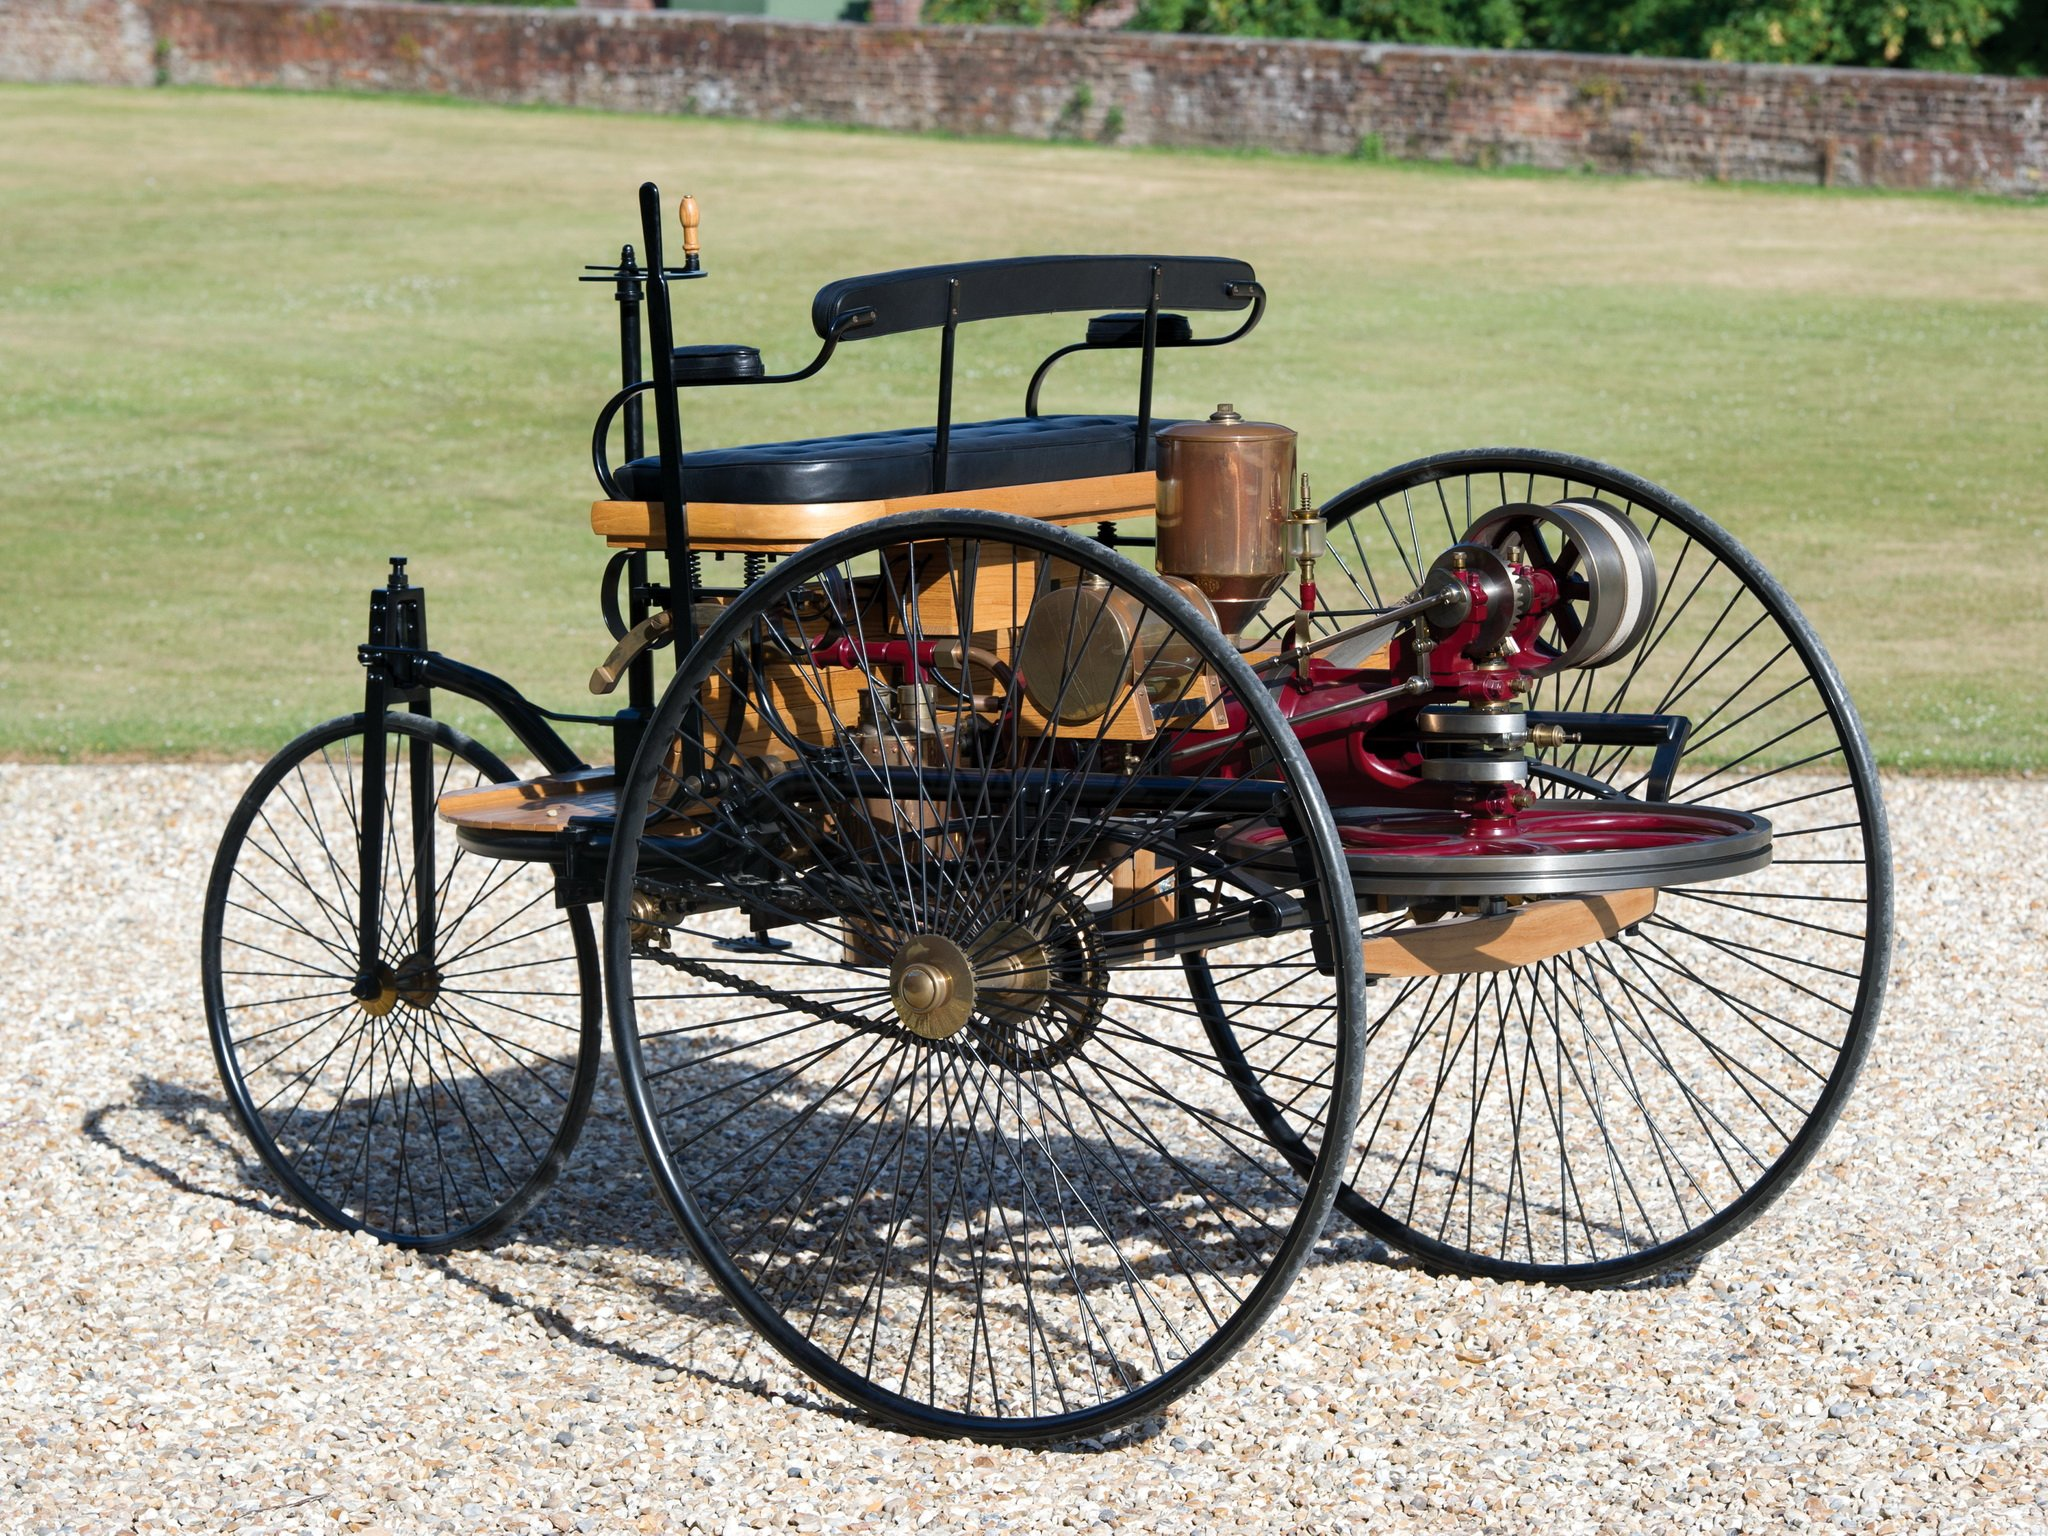 1885 benz patent motorwagen typ i retro wallpaper 2048x1536 452751 wallpaperup. Black Bedroom Furniture Sets. Home Design Ideas